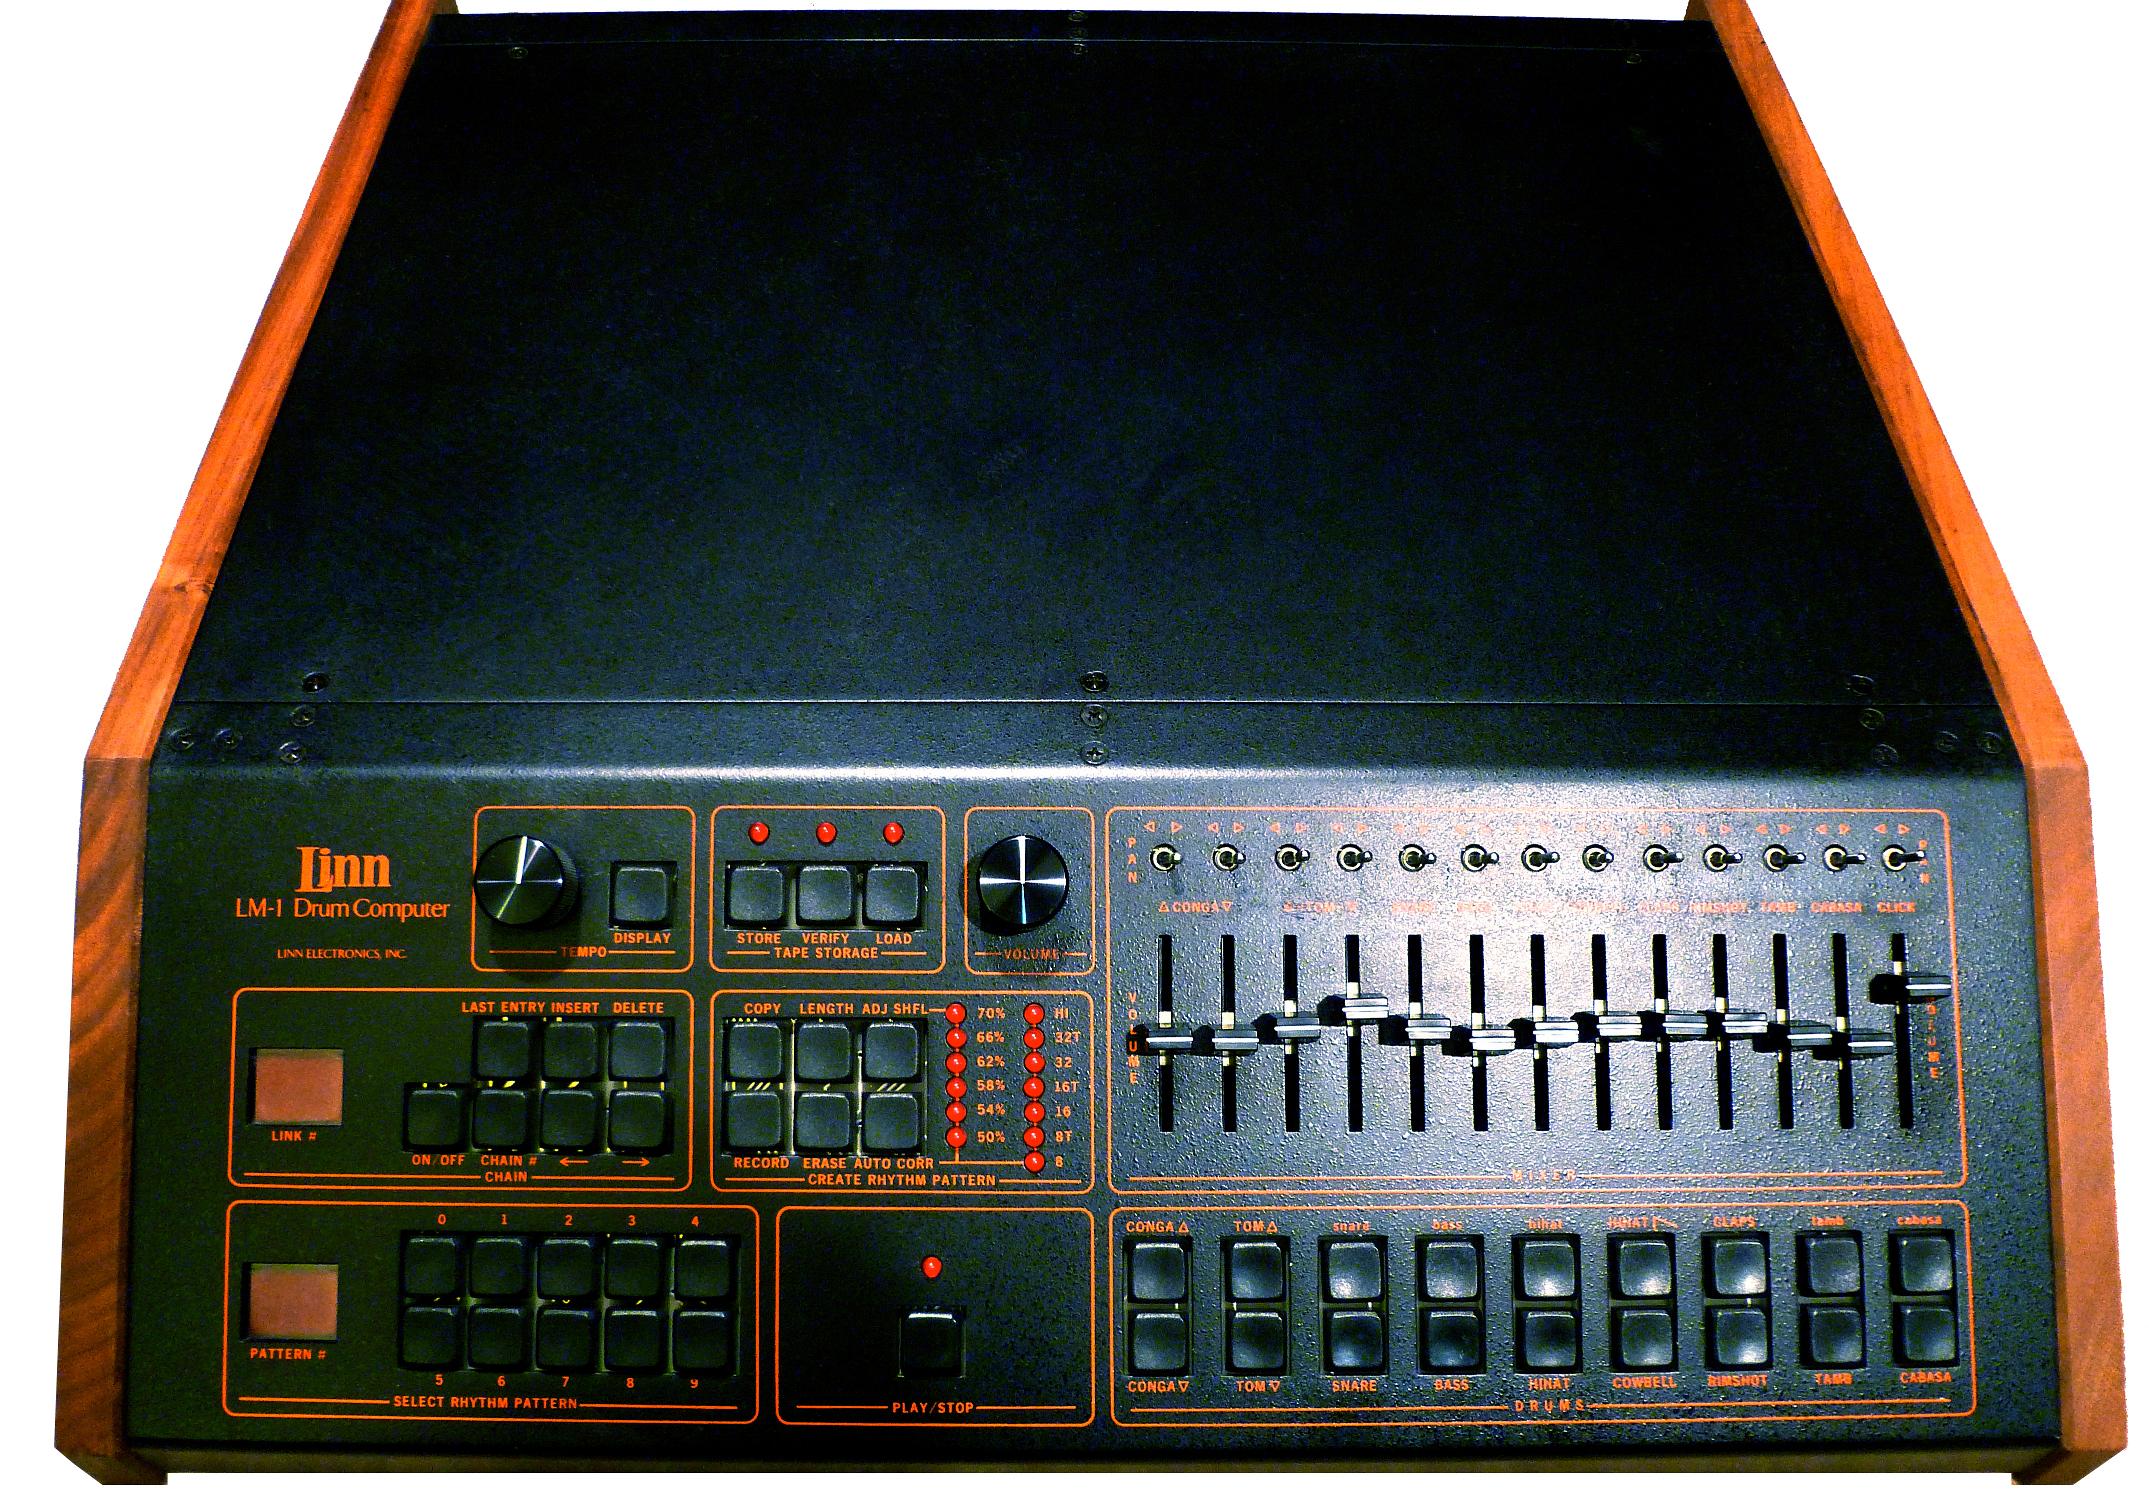 Linn LM-1 Drum Computer.jpg